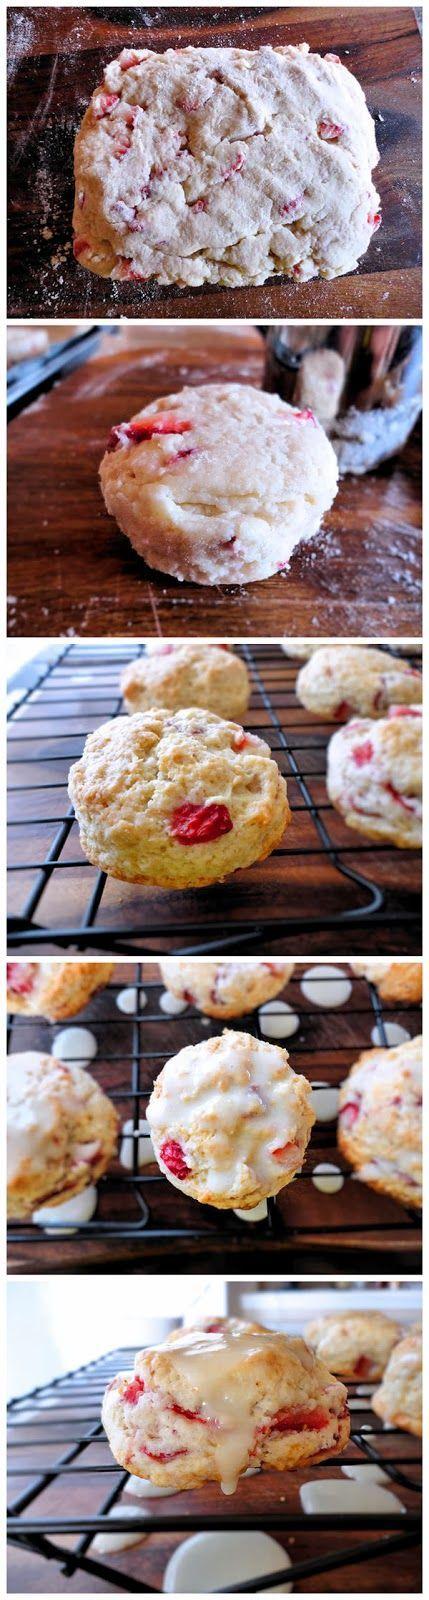 Orange Glazed Strawberry Scones | FOOD: bread and pastries | Pinterest